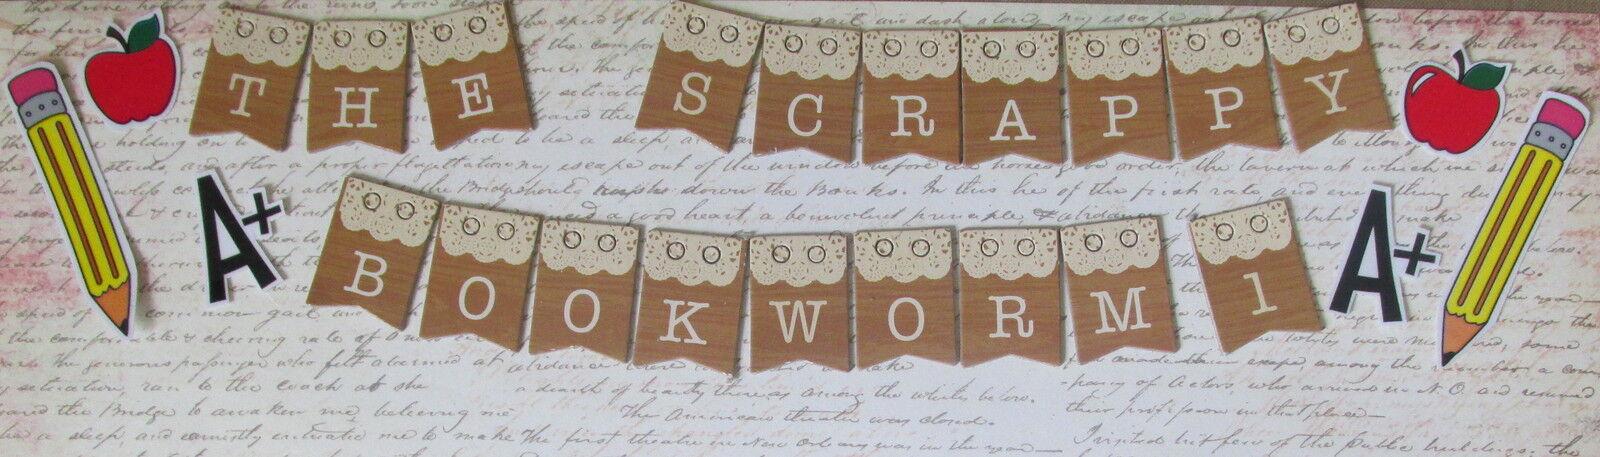 The Scrappy Bookworm1